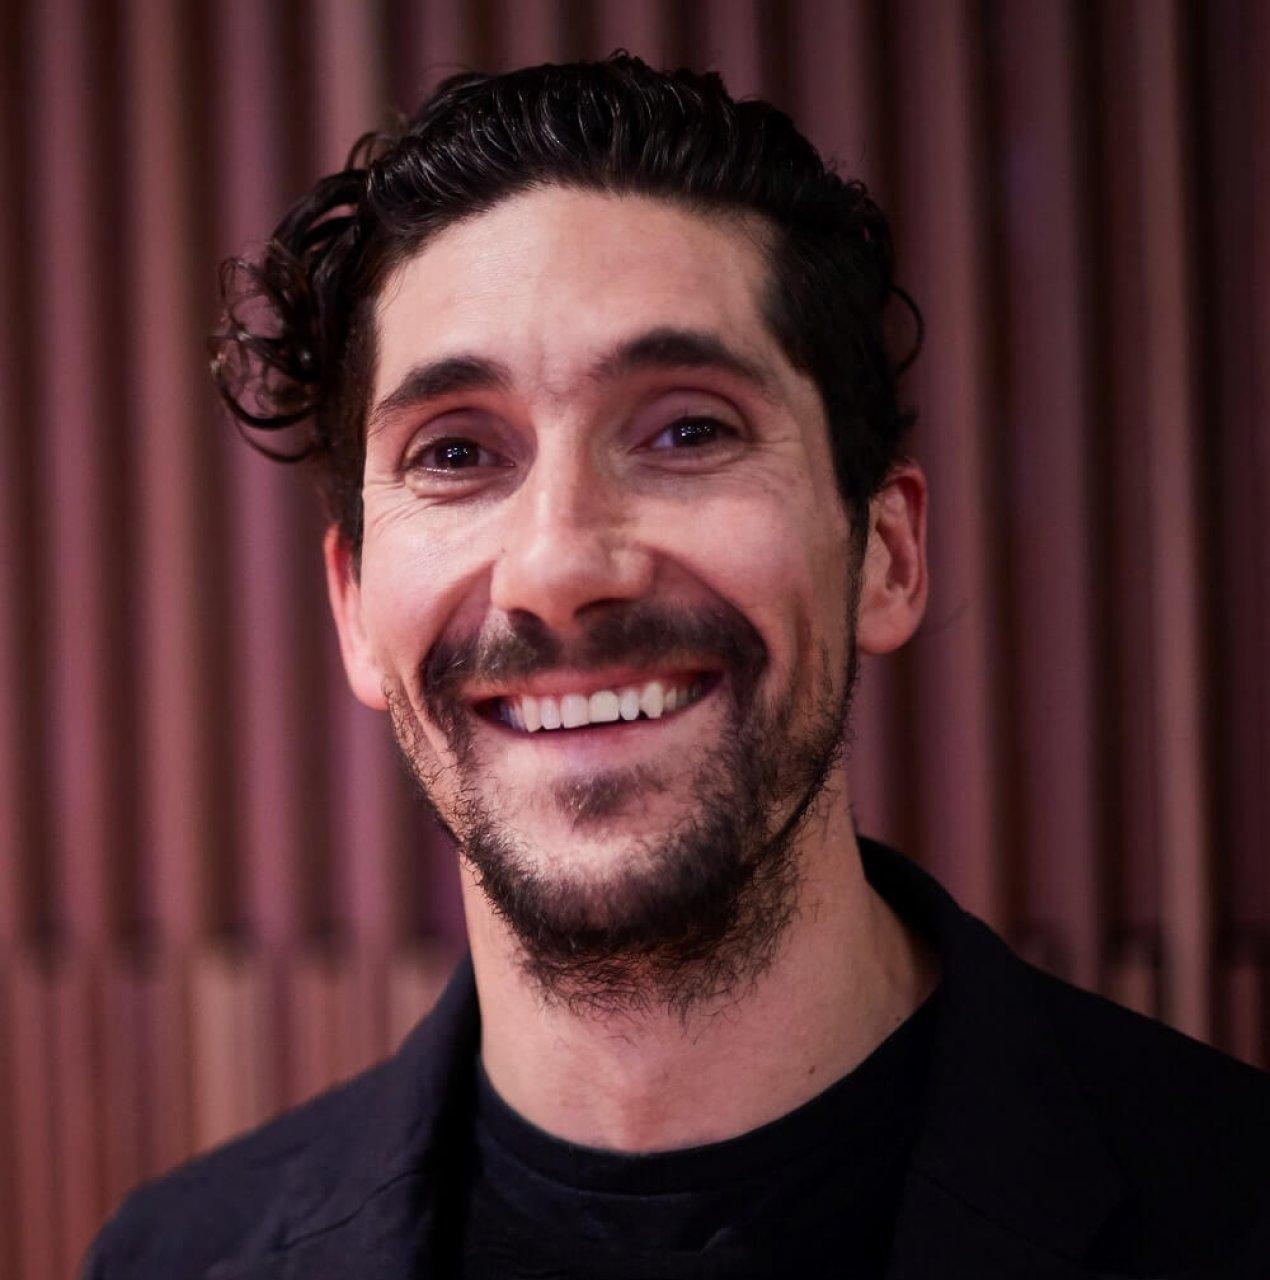 Gus Balbontin